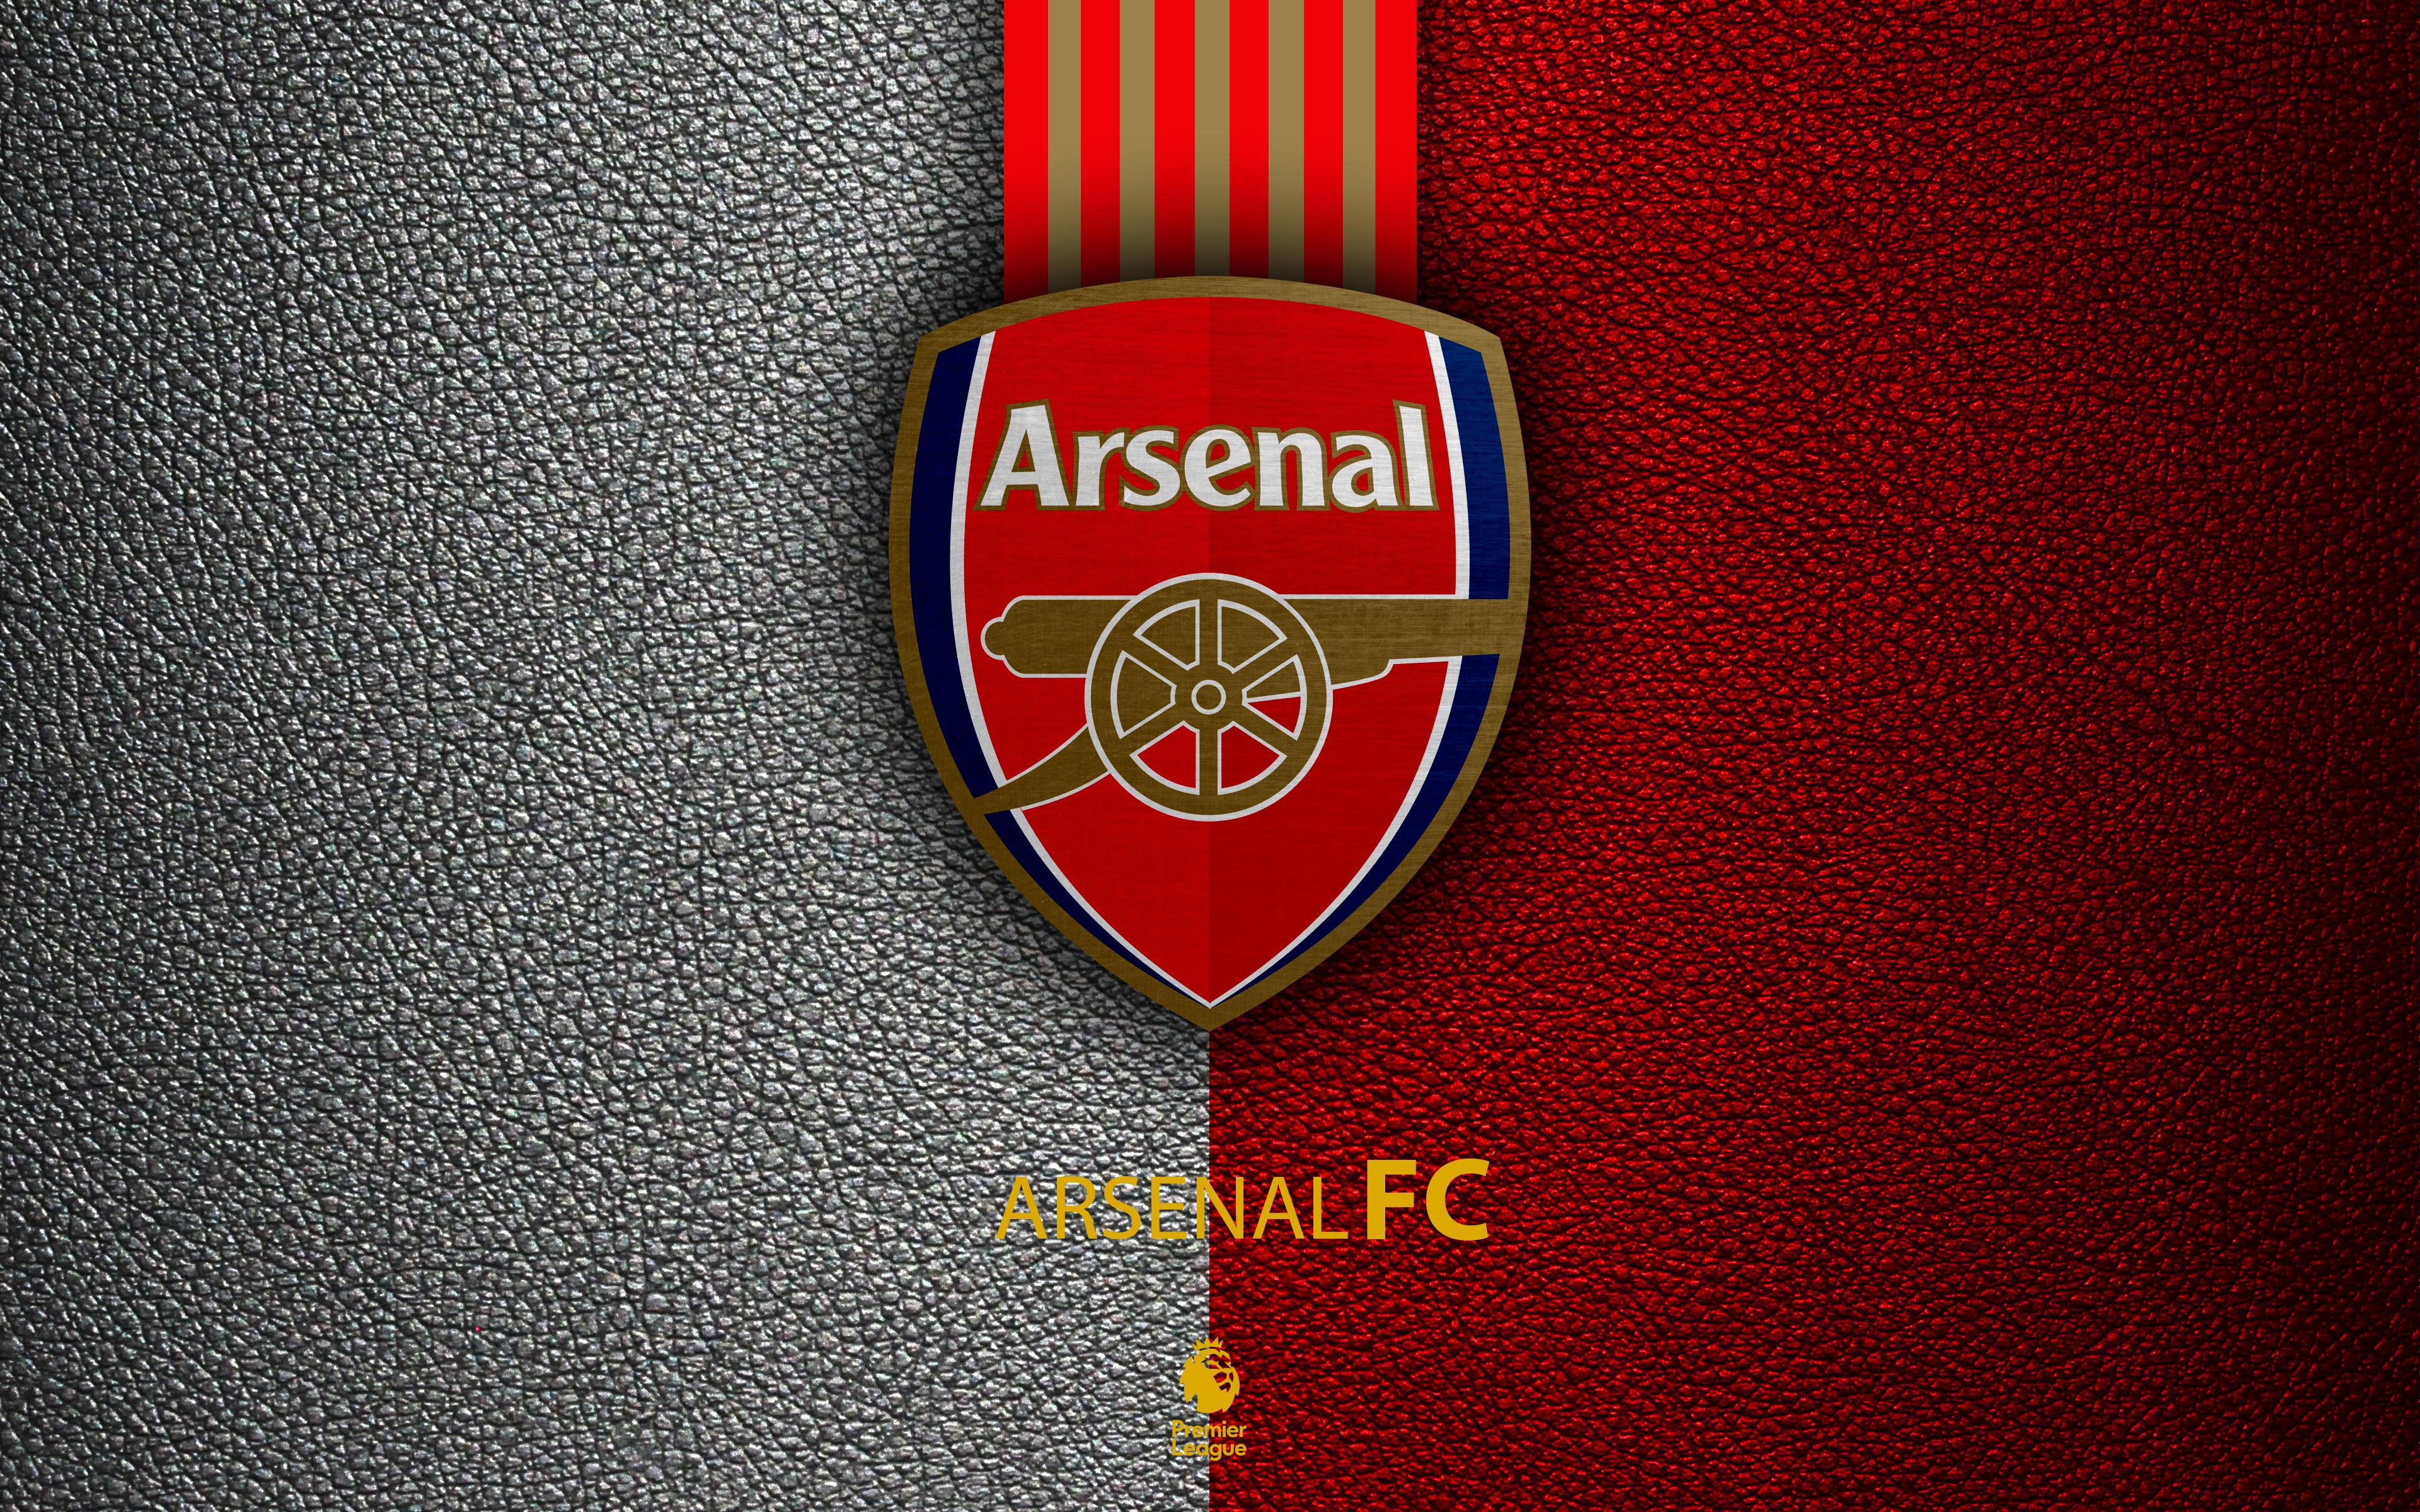 arsenal logo 4k ultra hd wallpaper